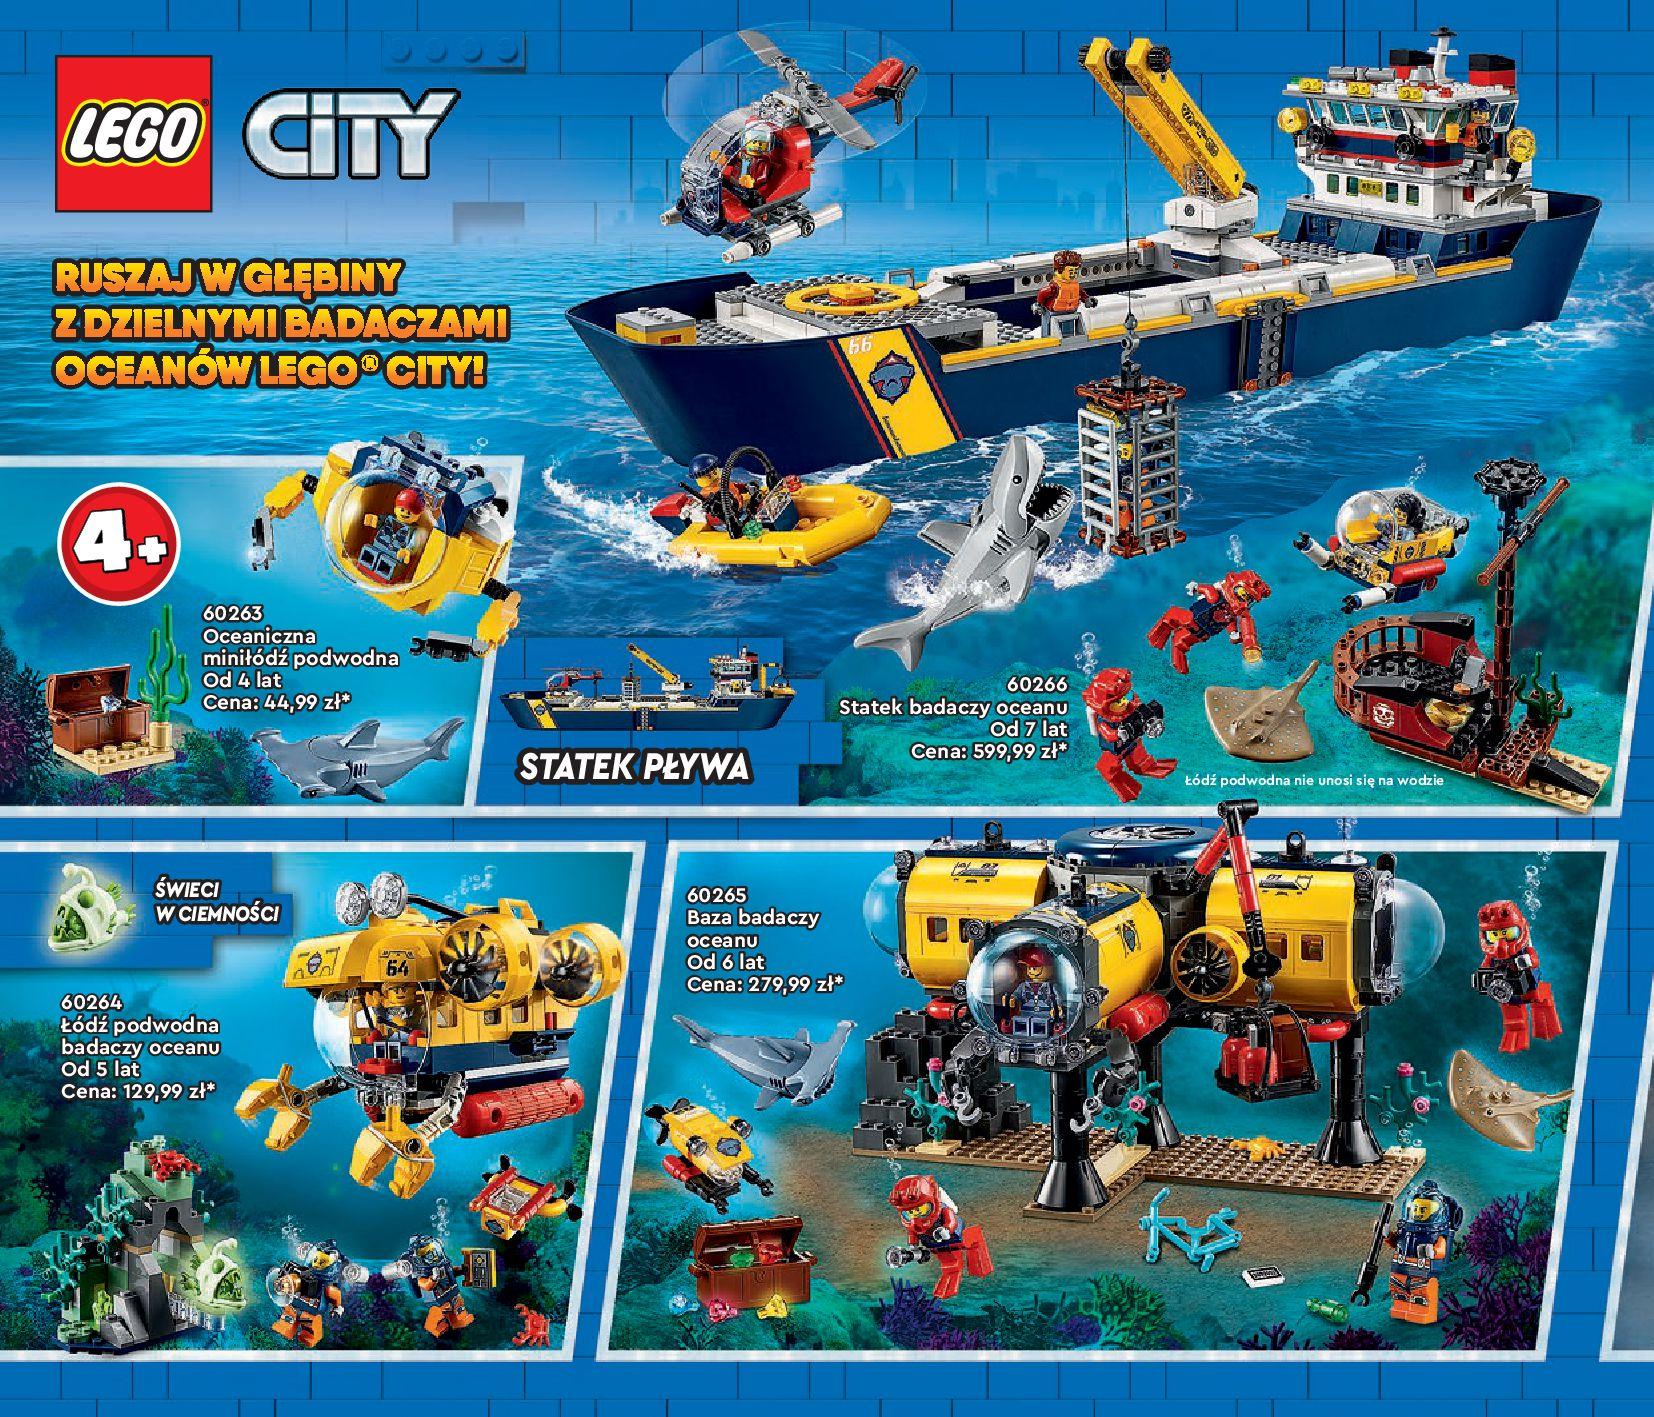 Lego Katalog 2021 Pdf